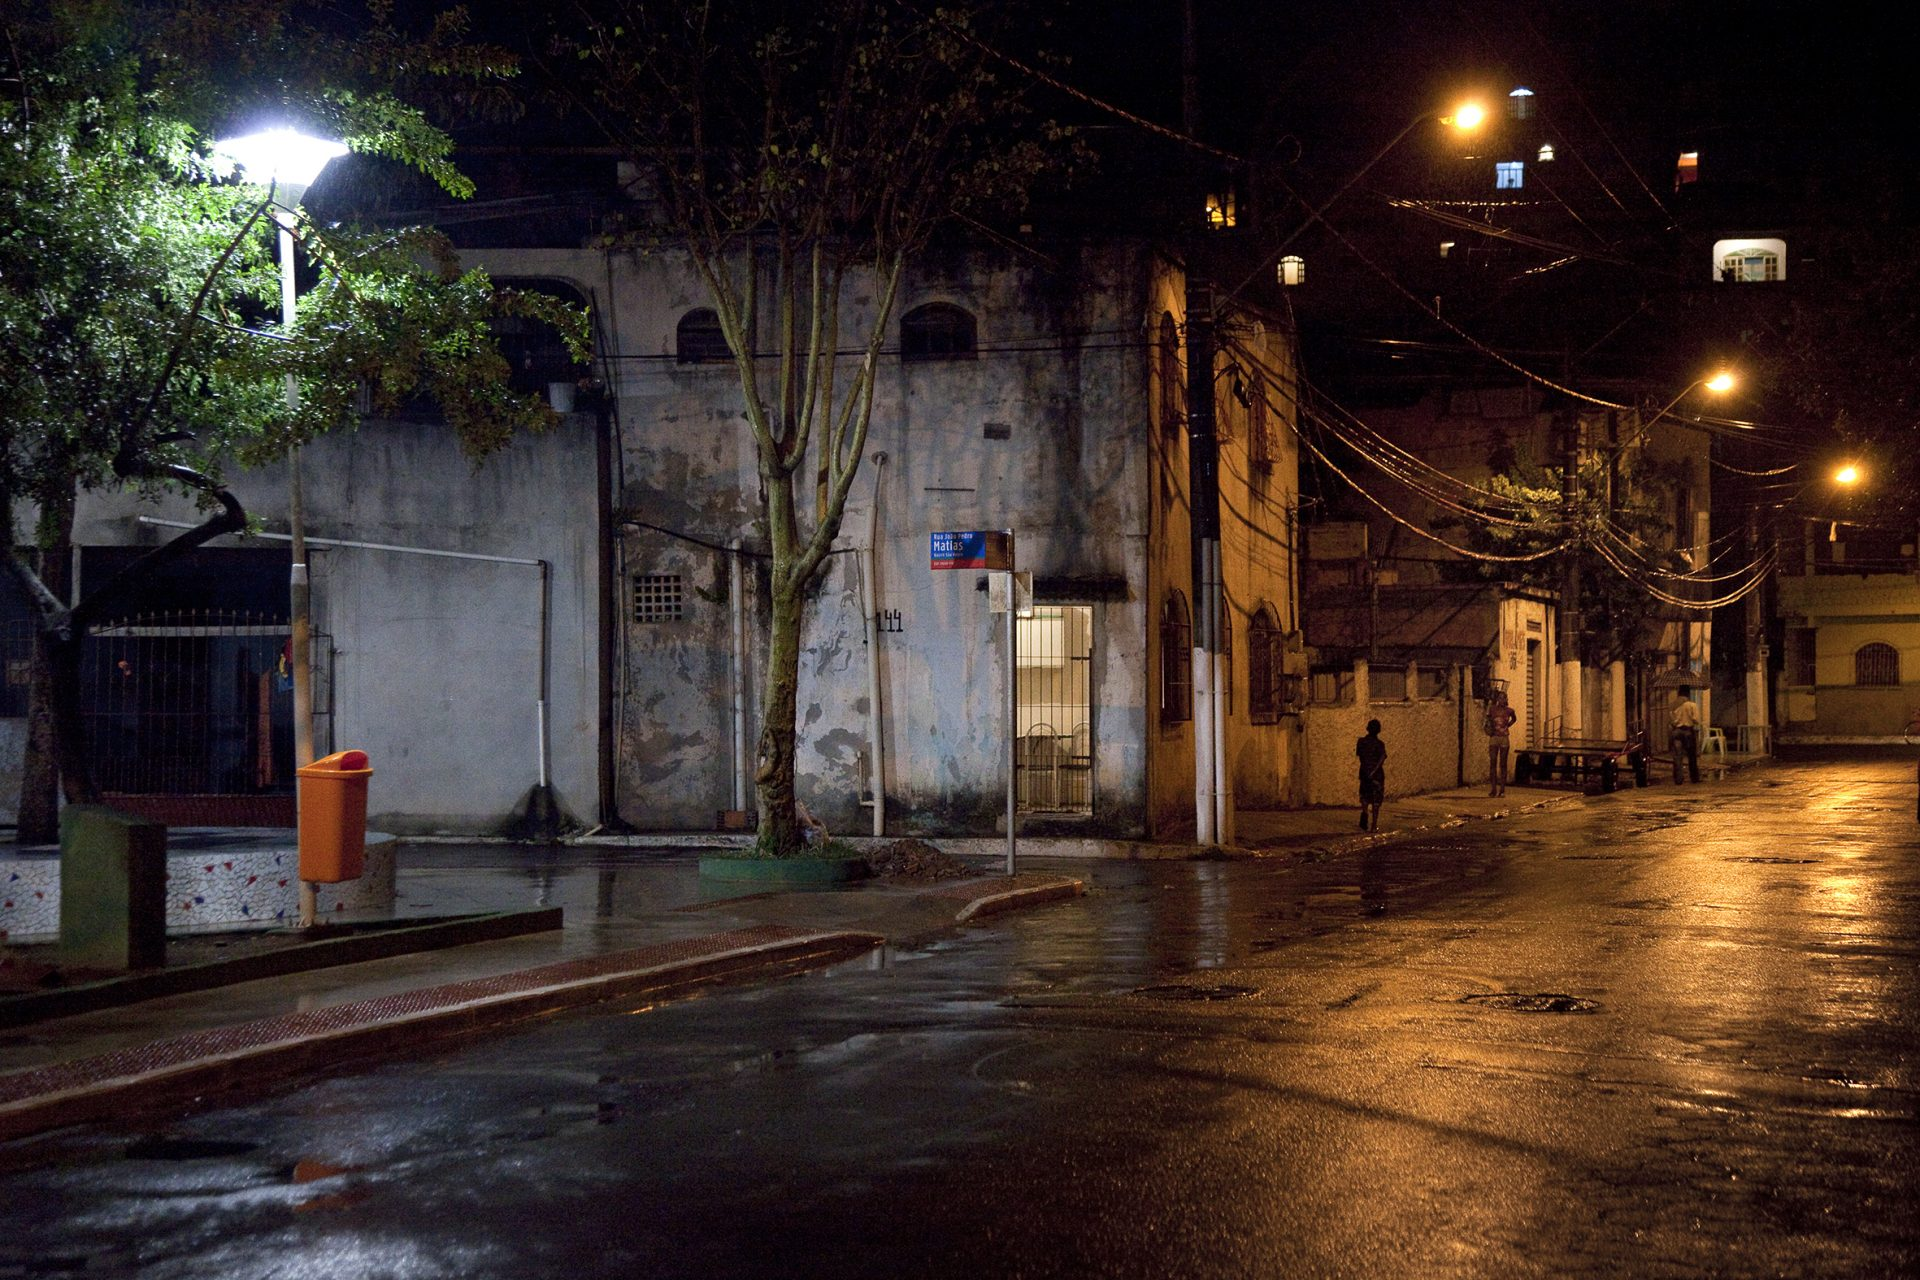 Favela Sáo Pedro bei Nacht.